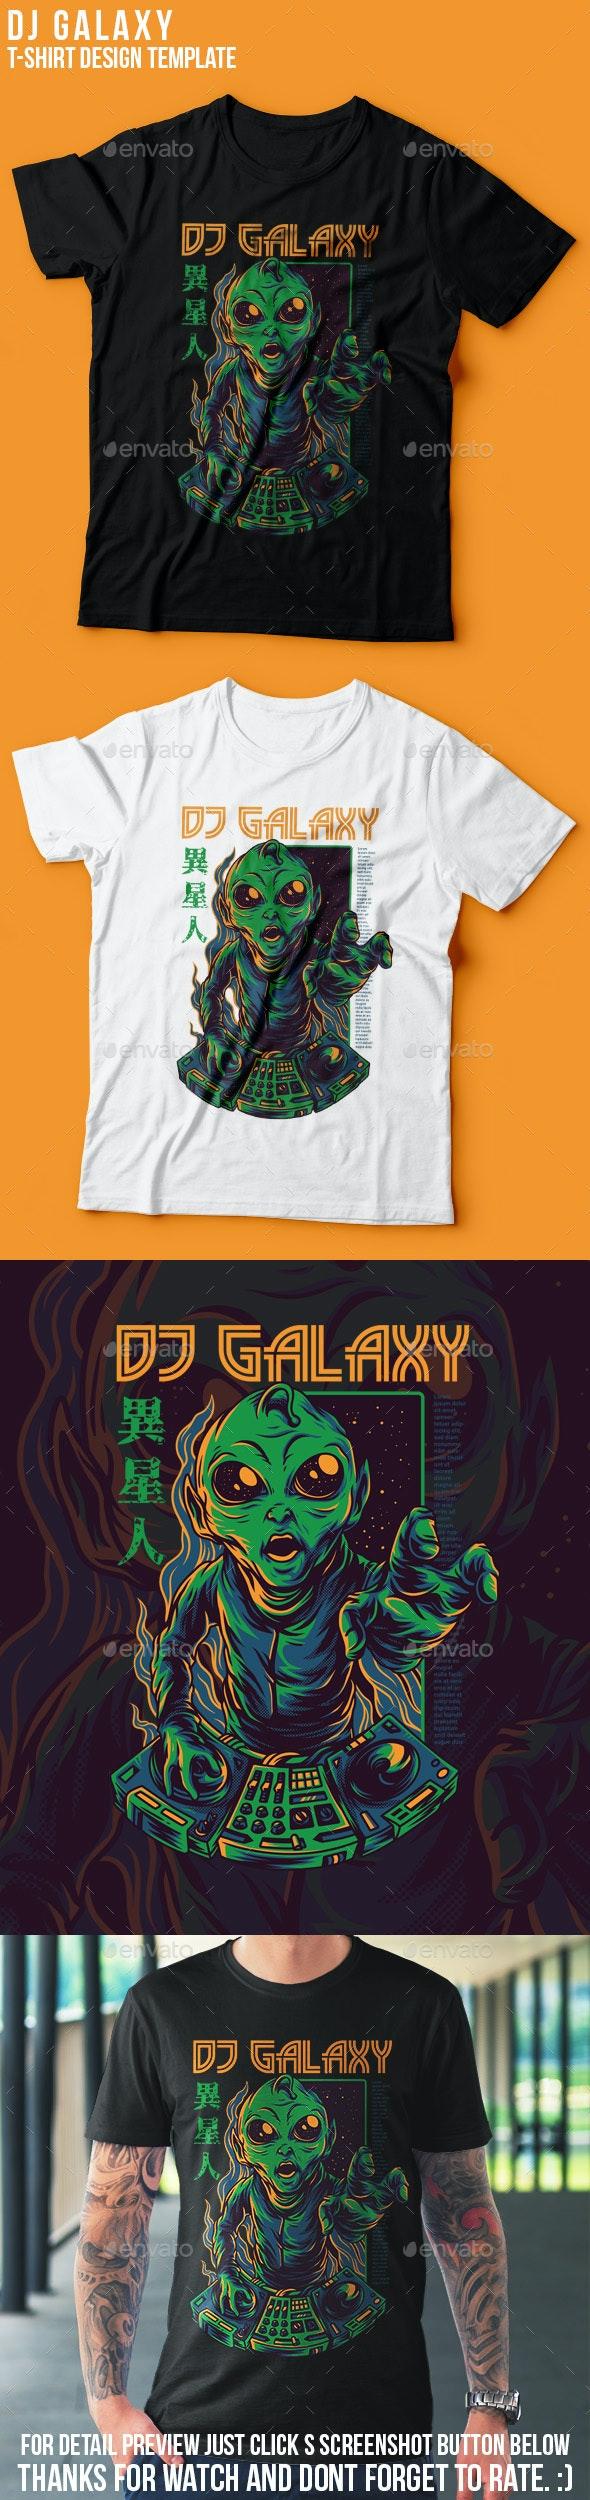 DJ Galaxy T-Shirt Design - Events T-Shirts